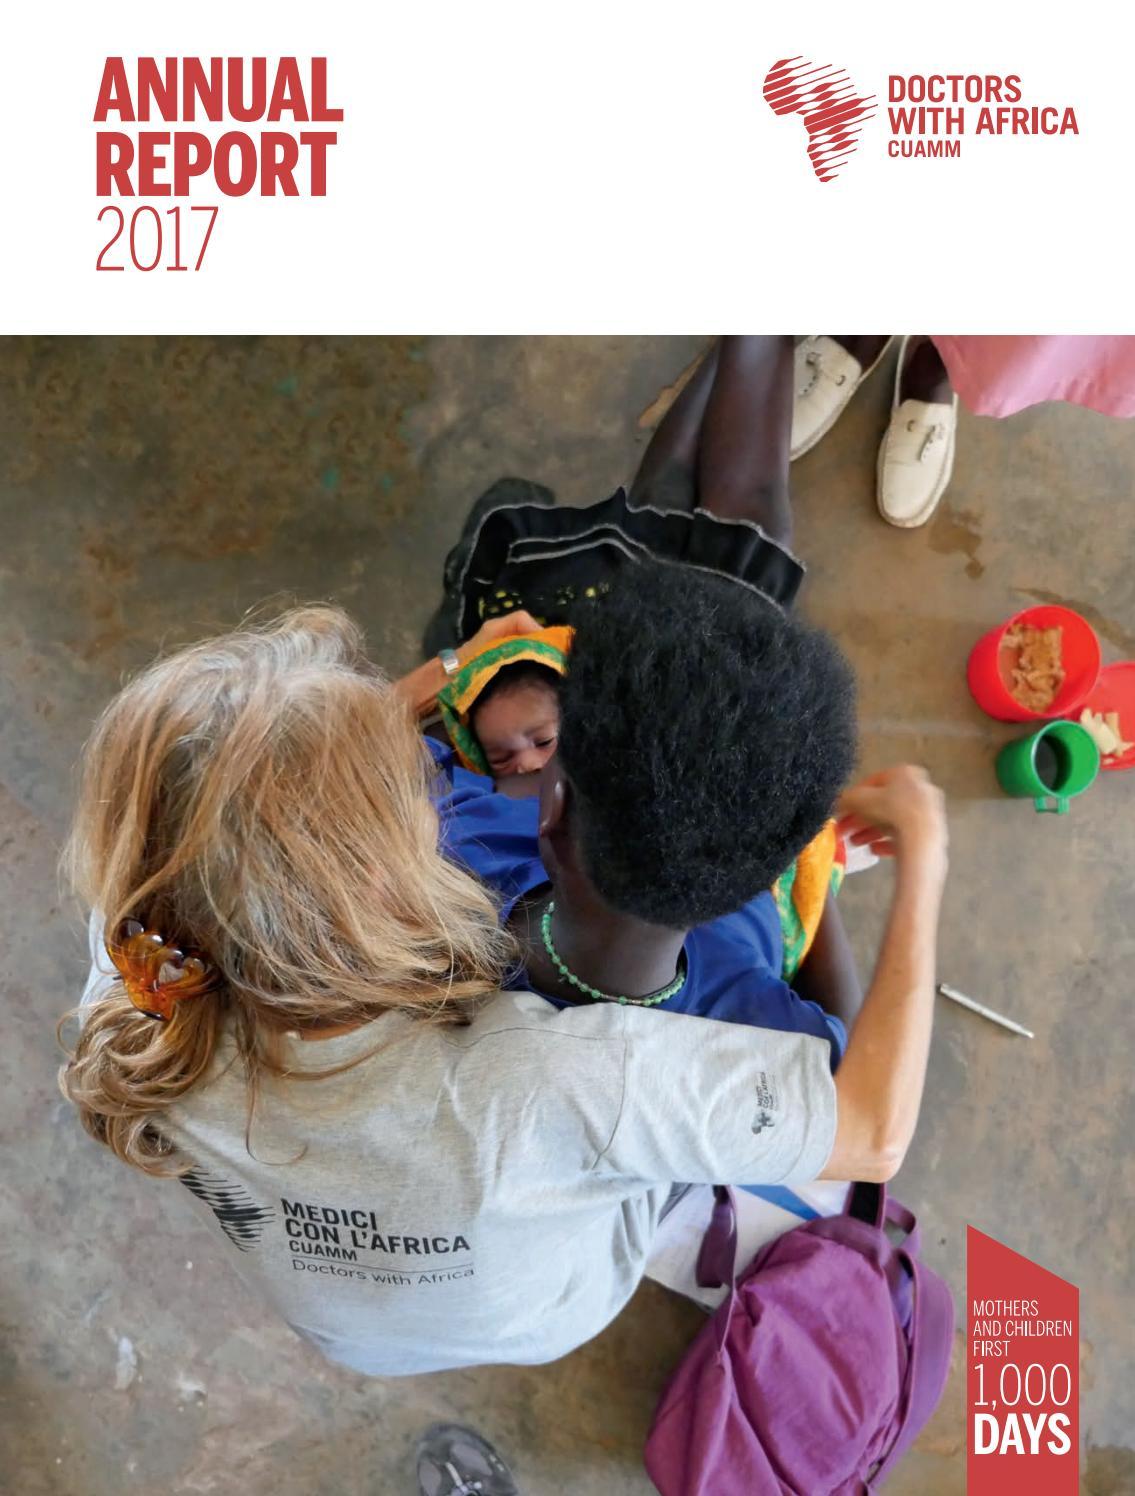 Alessio Virgili Architetto annual report 2017 (en) by medici con l'africa cuamm - issuu